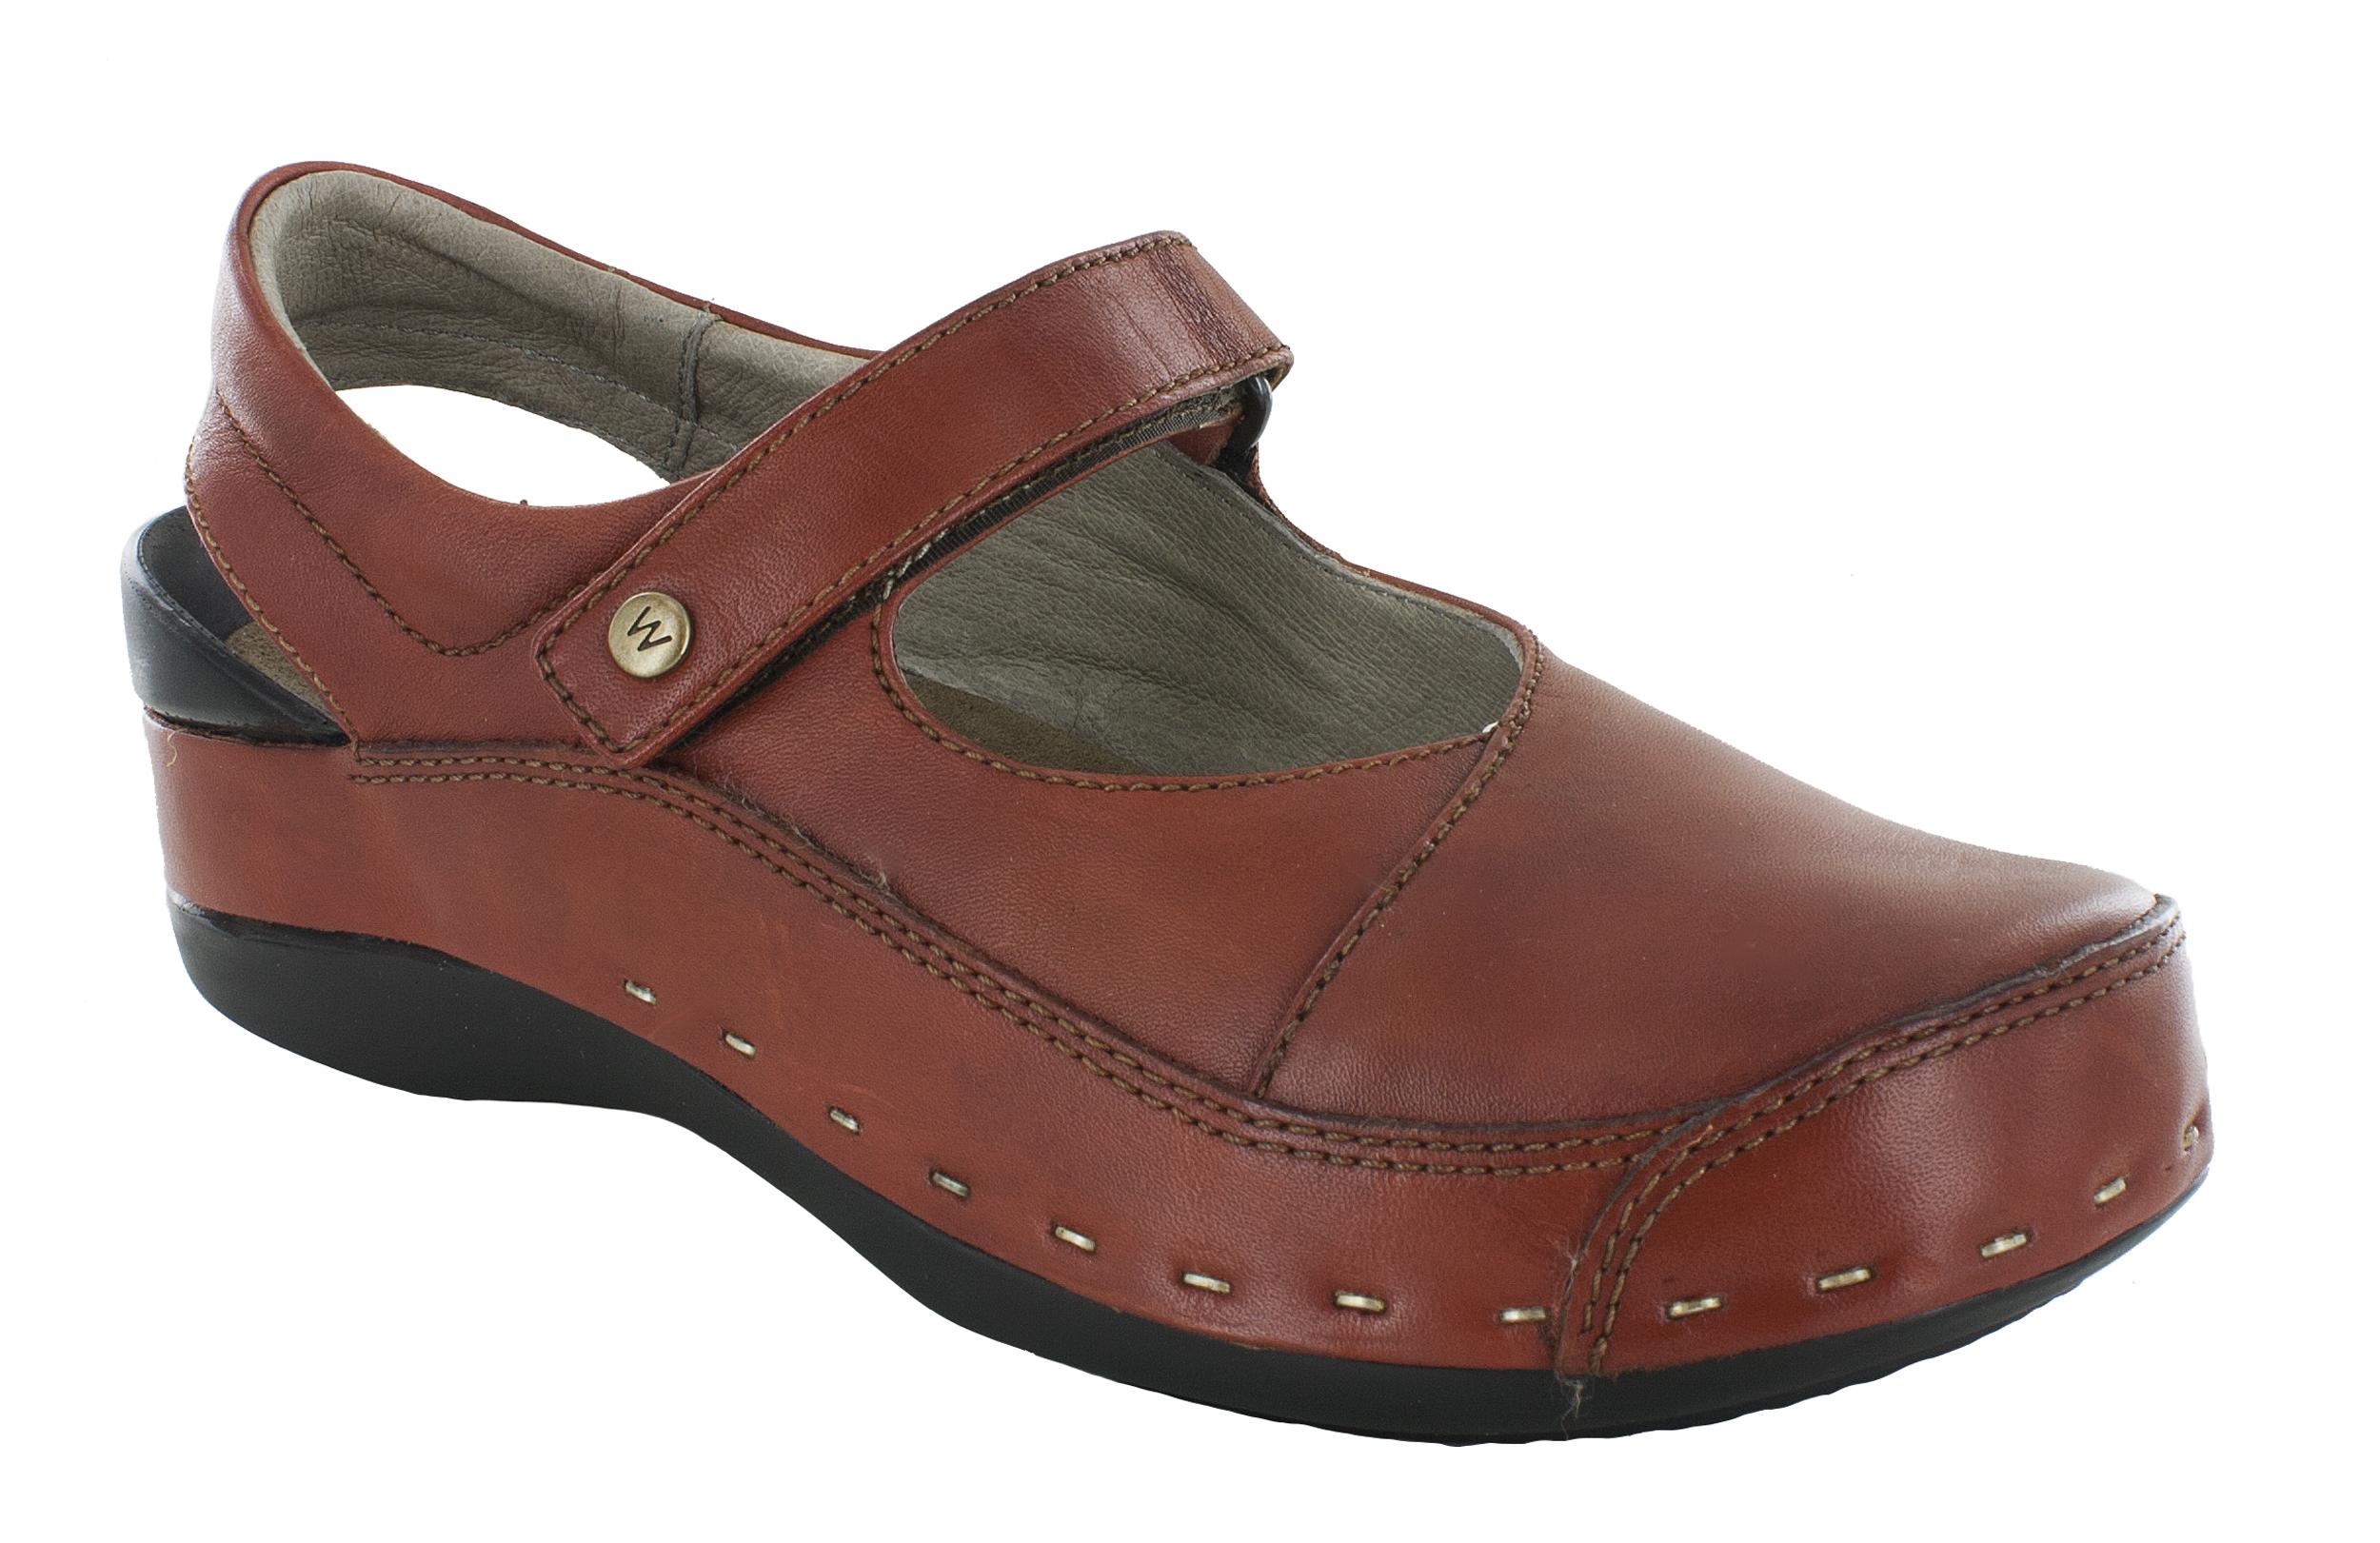 From Shoes From Ladies Shoes Shoes Ladies From Wolky Wolky Ladies 8kNnw0XOP